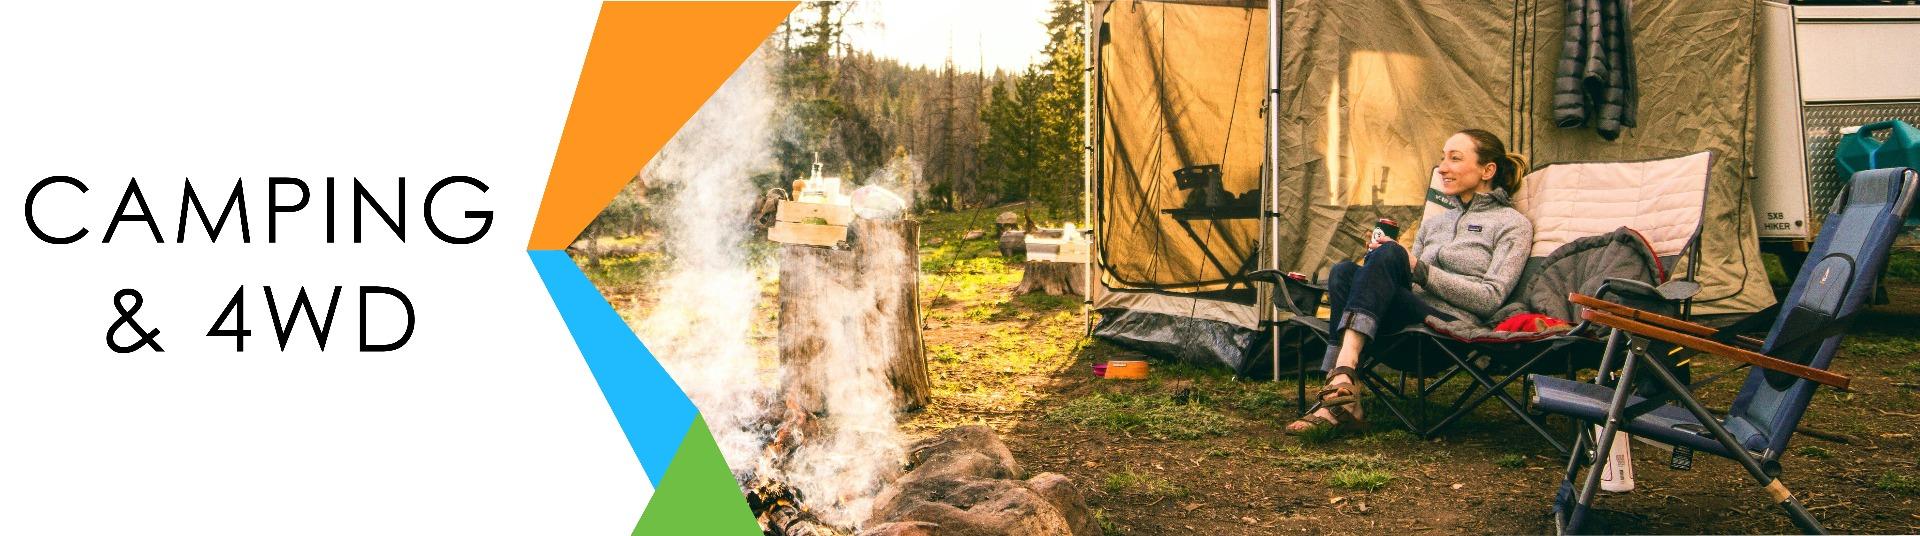 Camping & 4WD